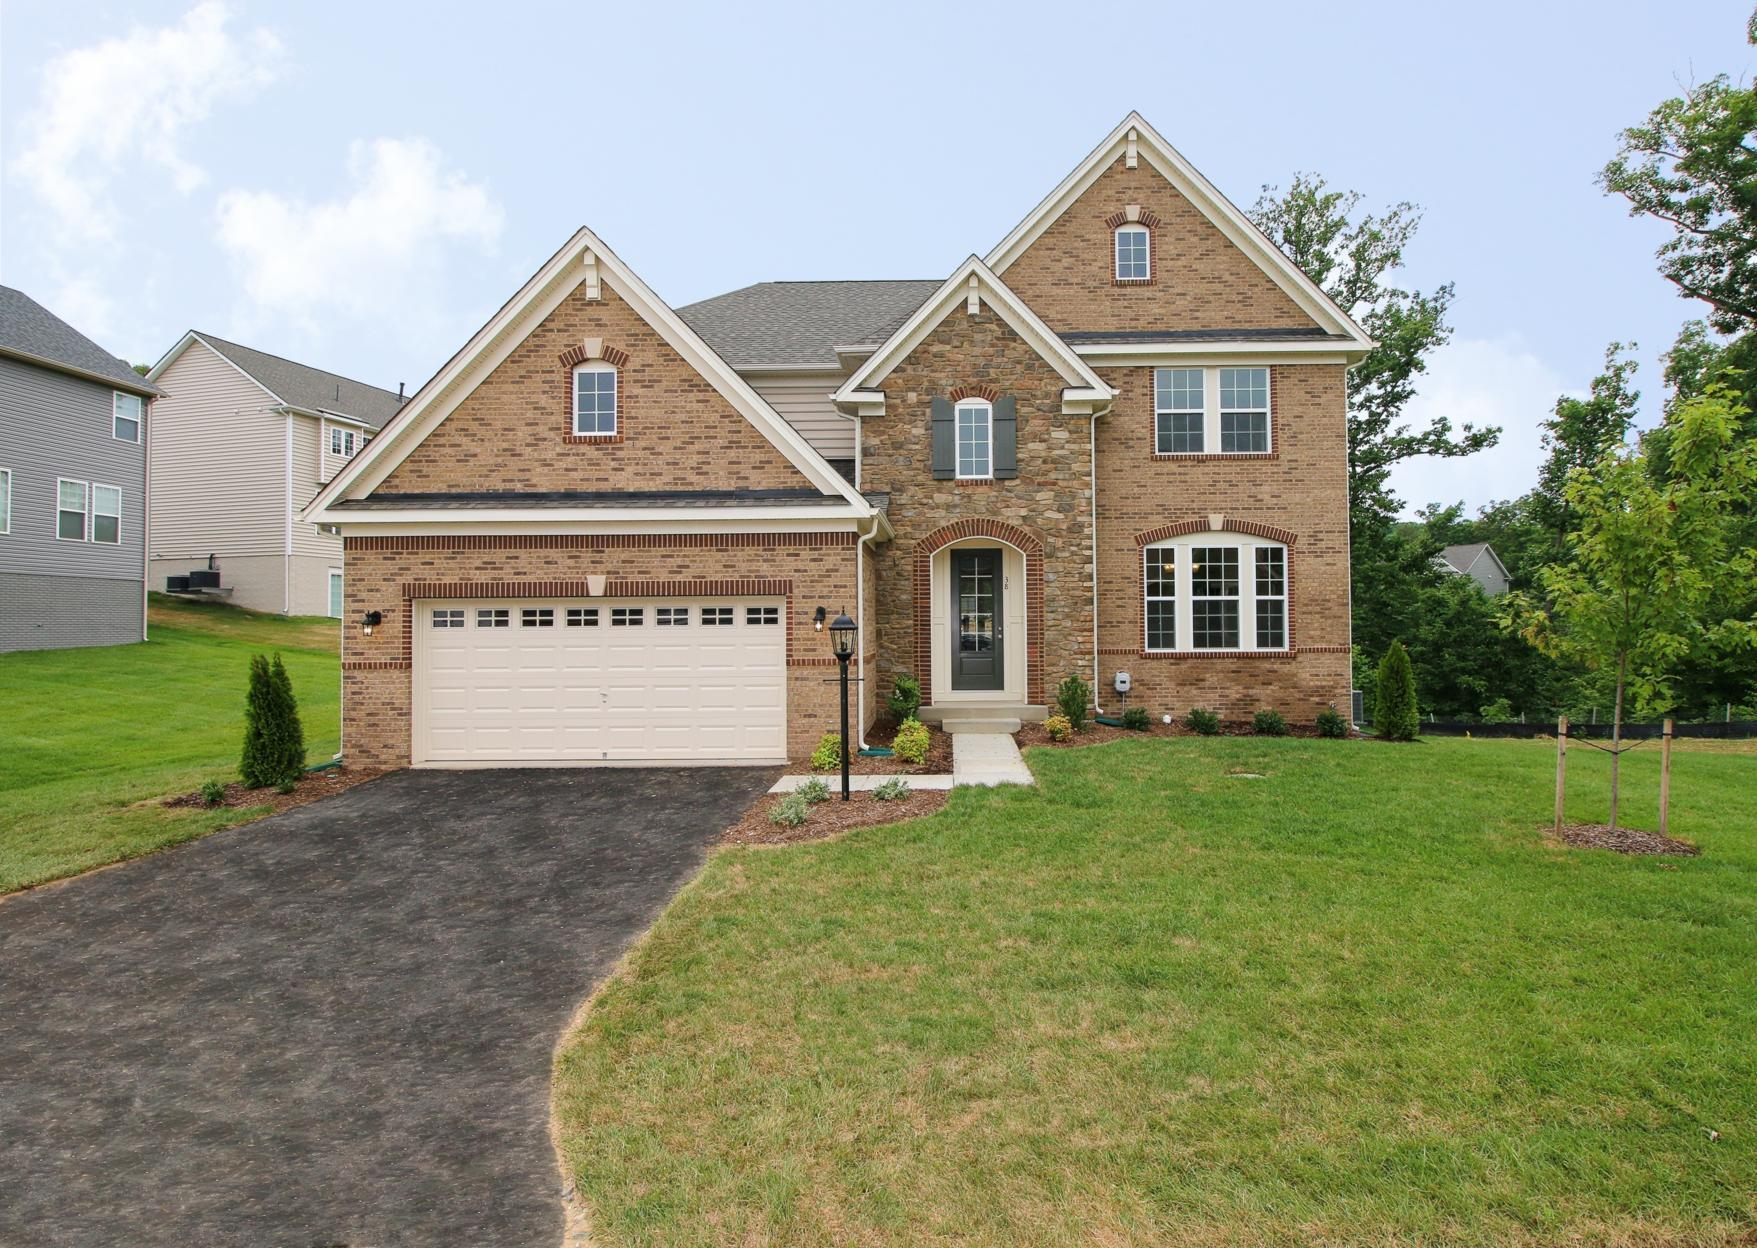 Single Family for Active at Rowan 38 Bradbury Way Stafford, Virginia 22554 United States